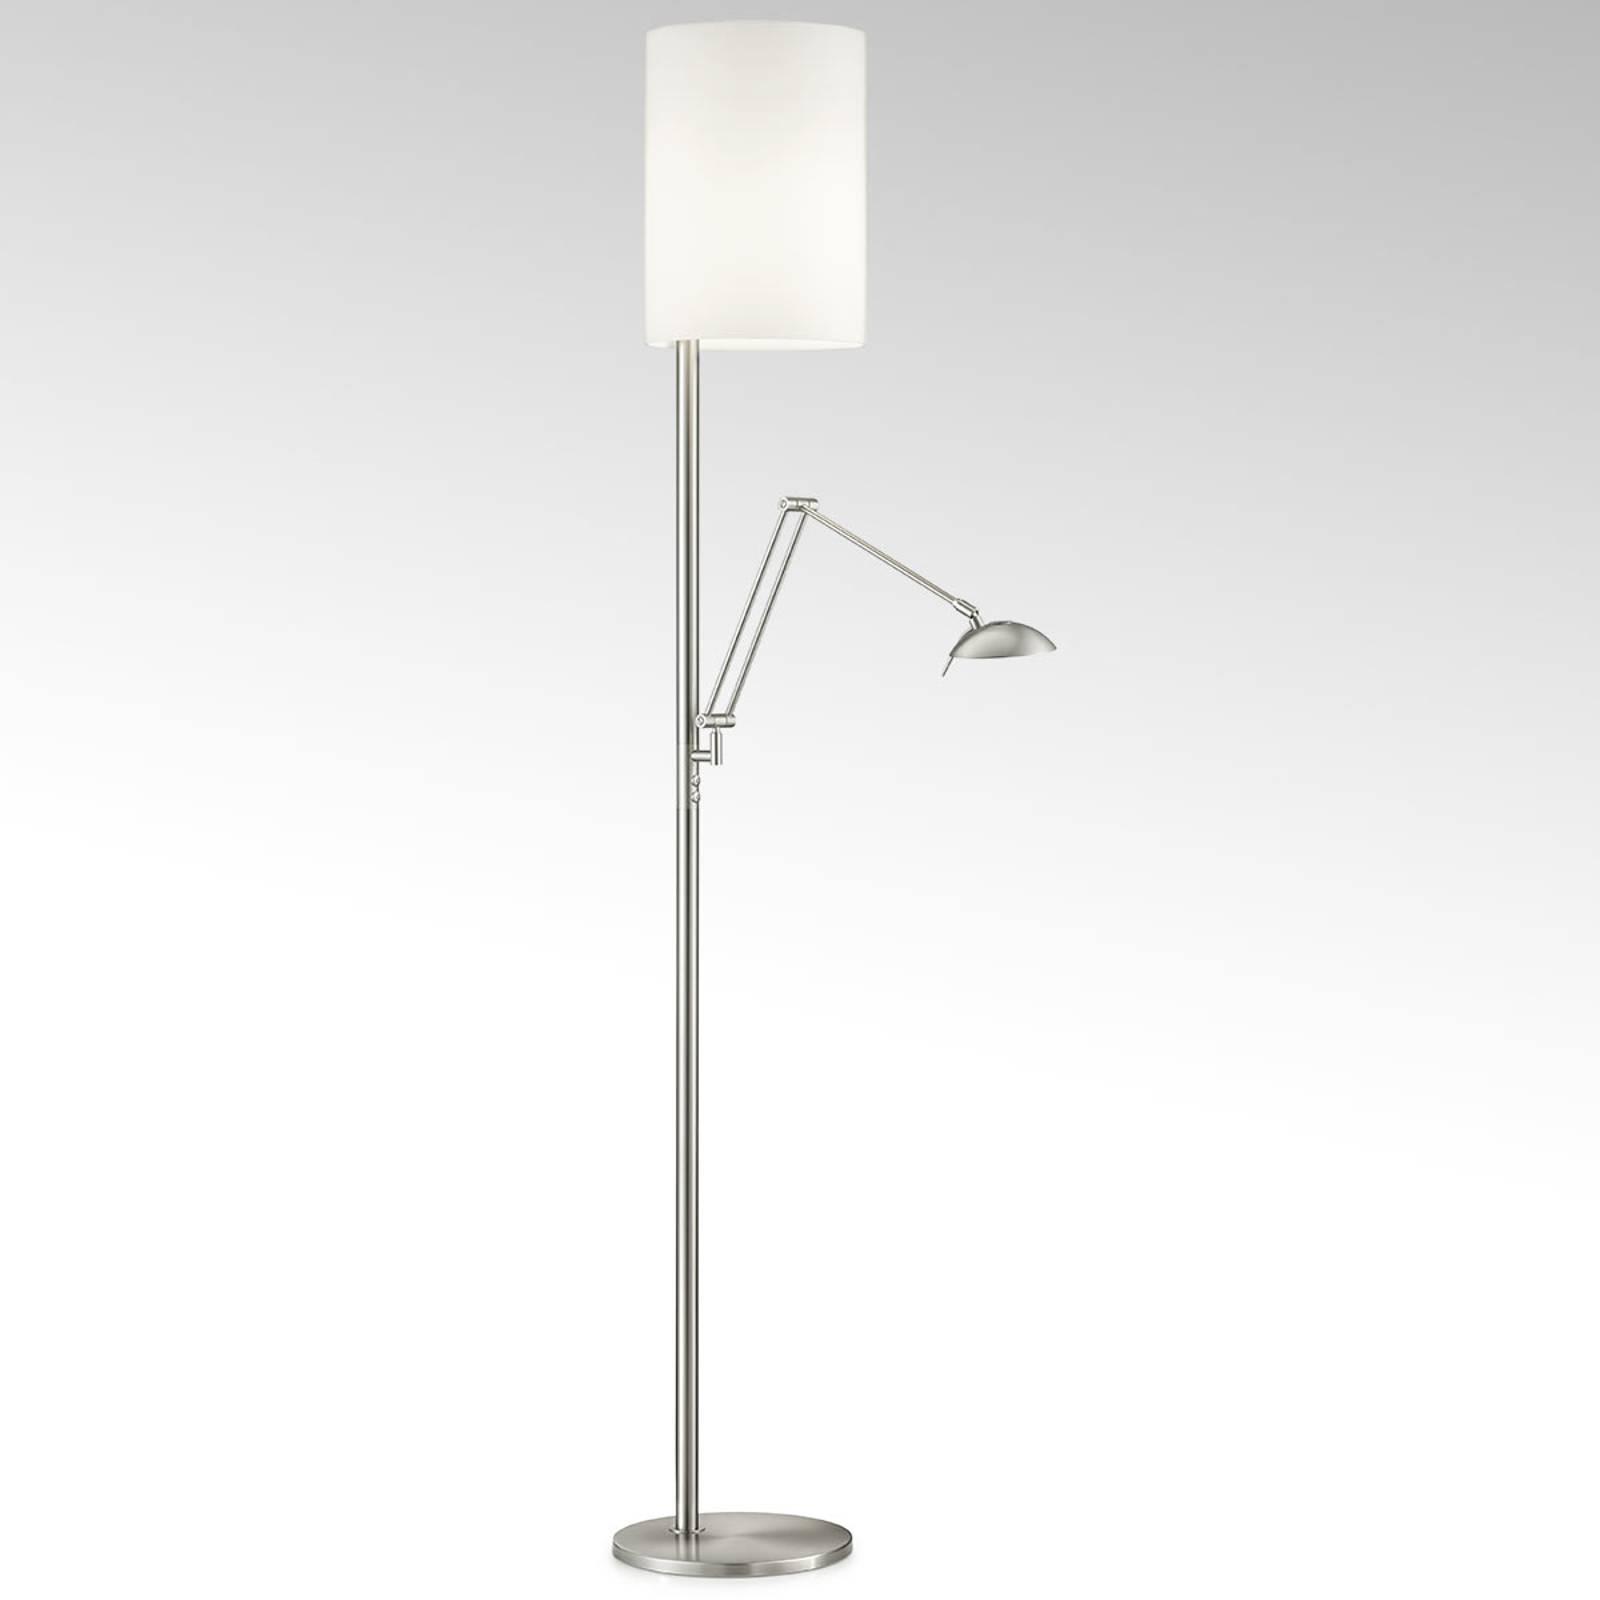 Lampadaire LED Nola nickel mat